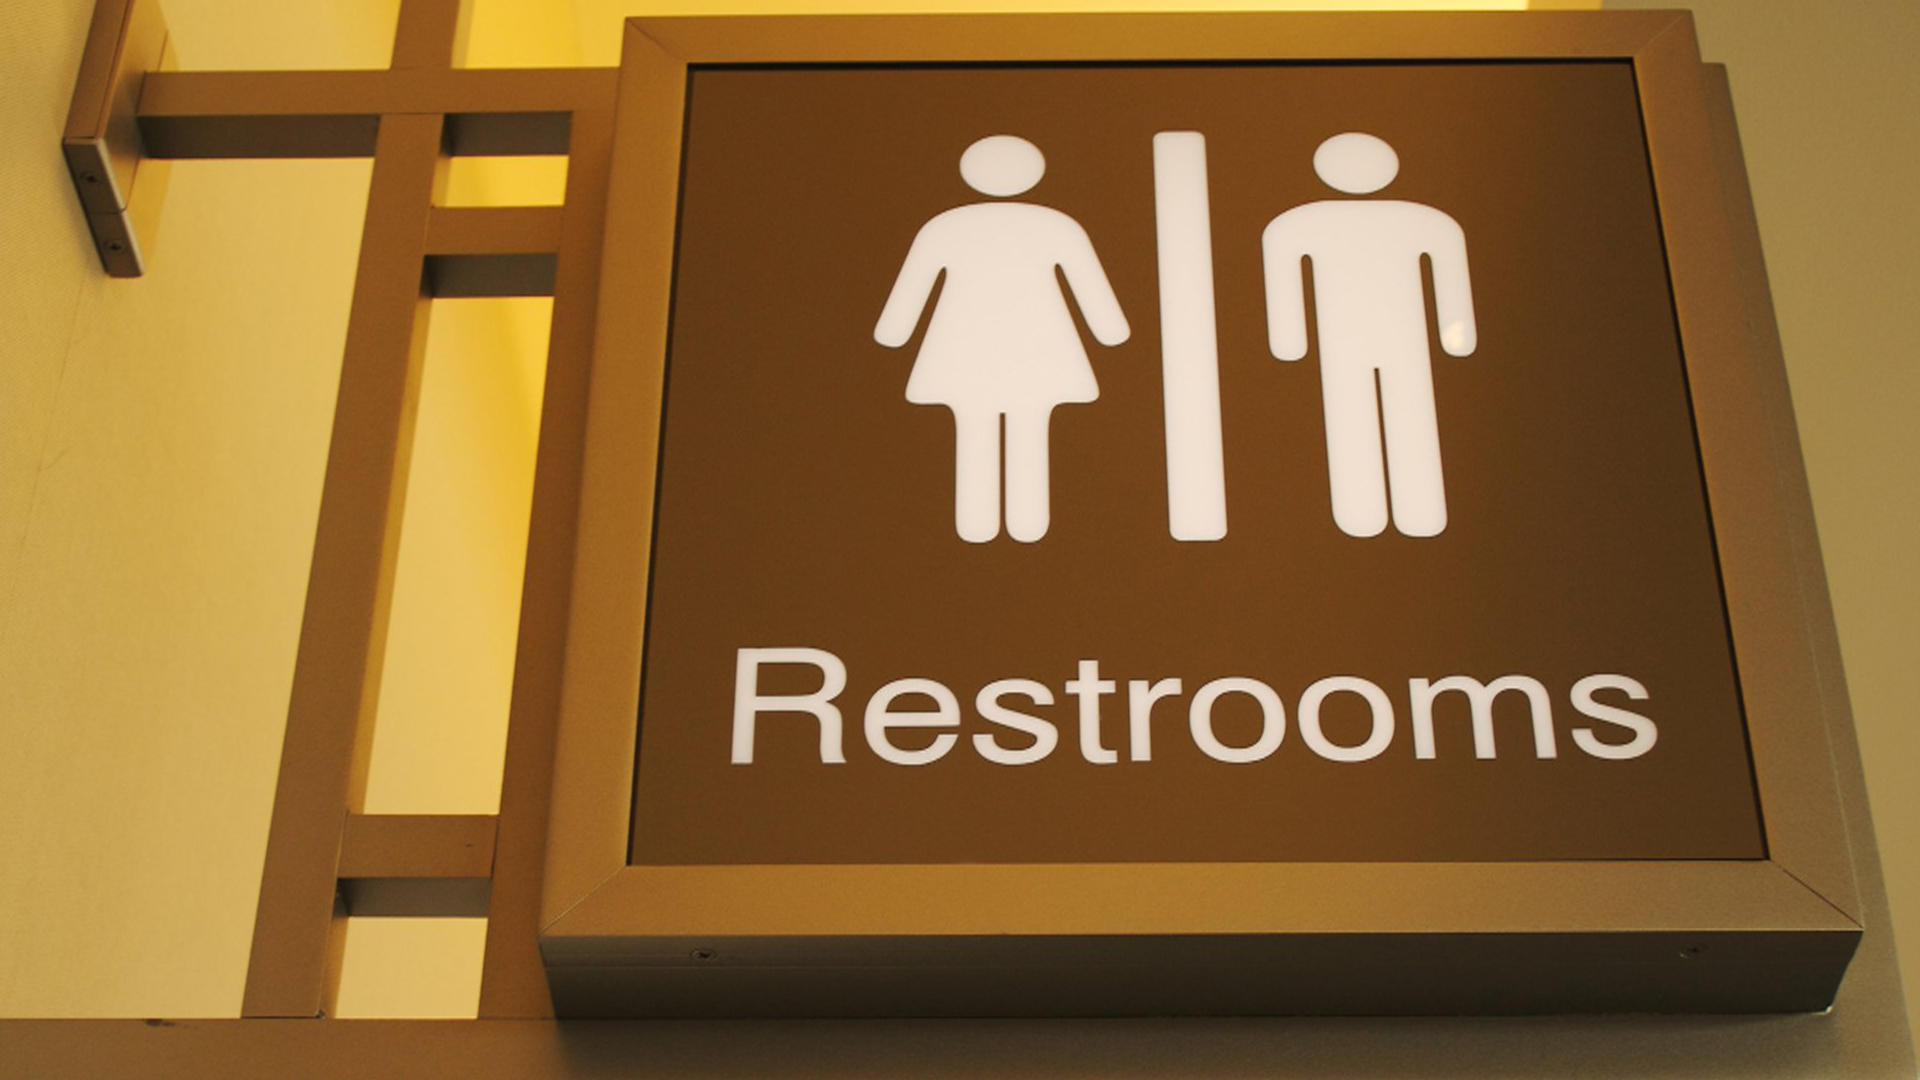 Washington Tries To Overturn Transgender Bathroom Law